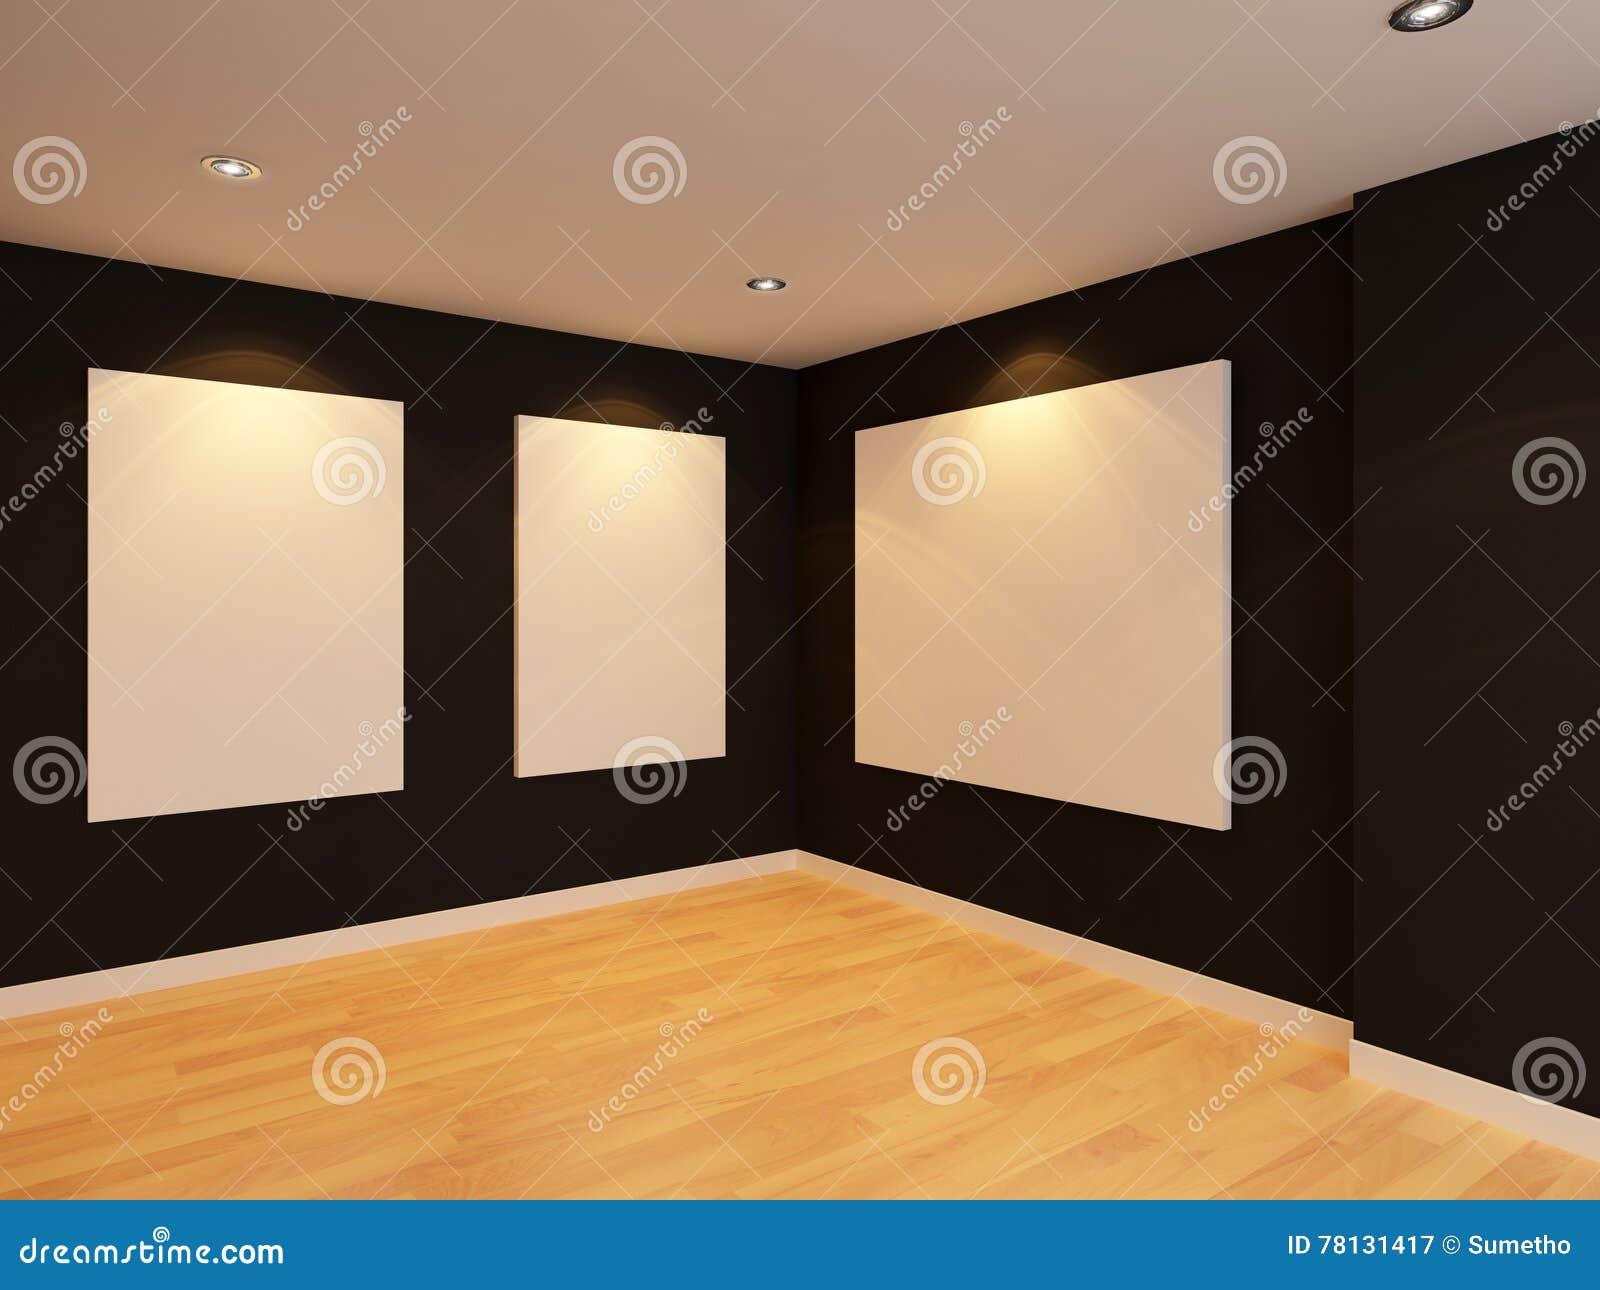 Pareti In Tela : Quadro da parete luminoso triangolo d oro stampa du tela